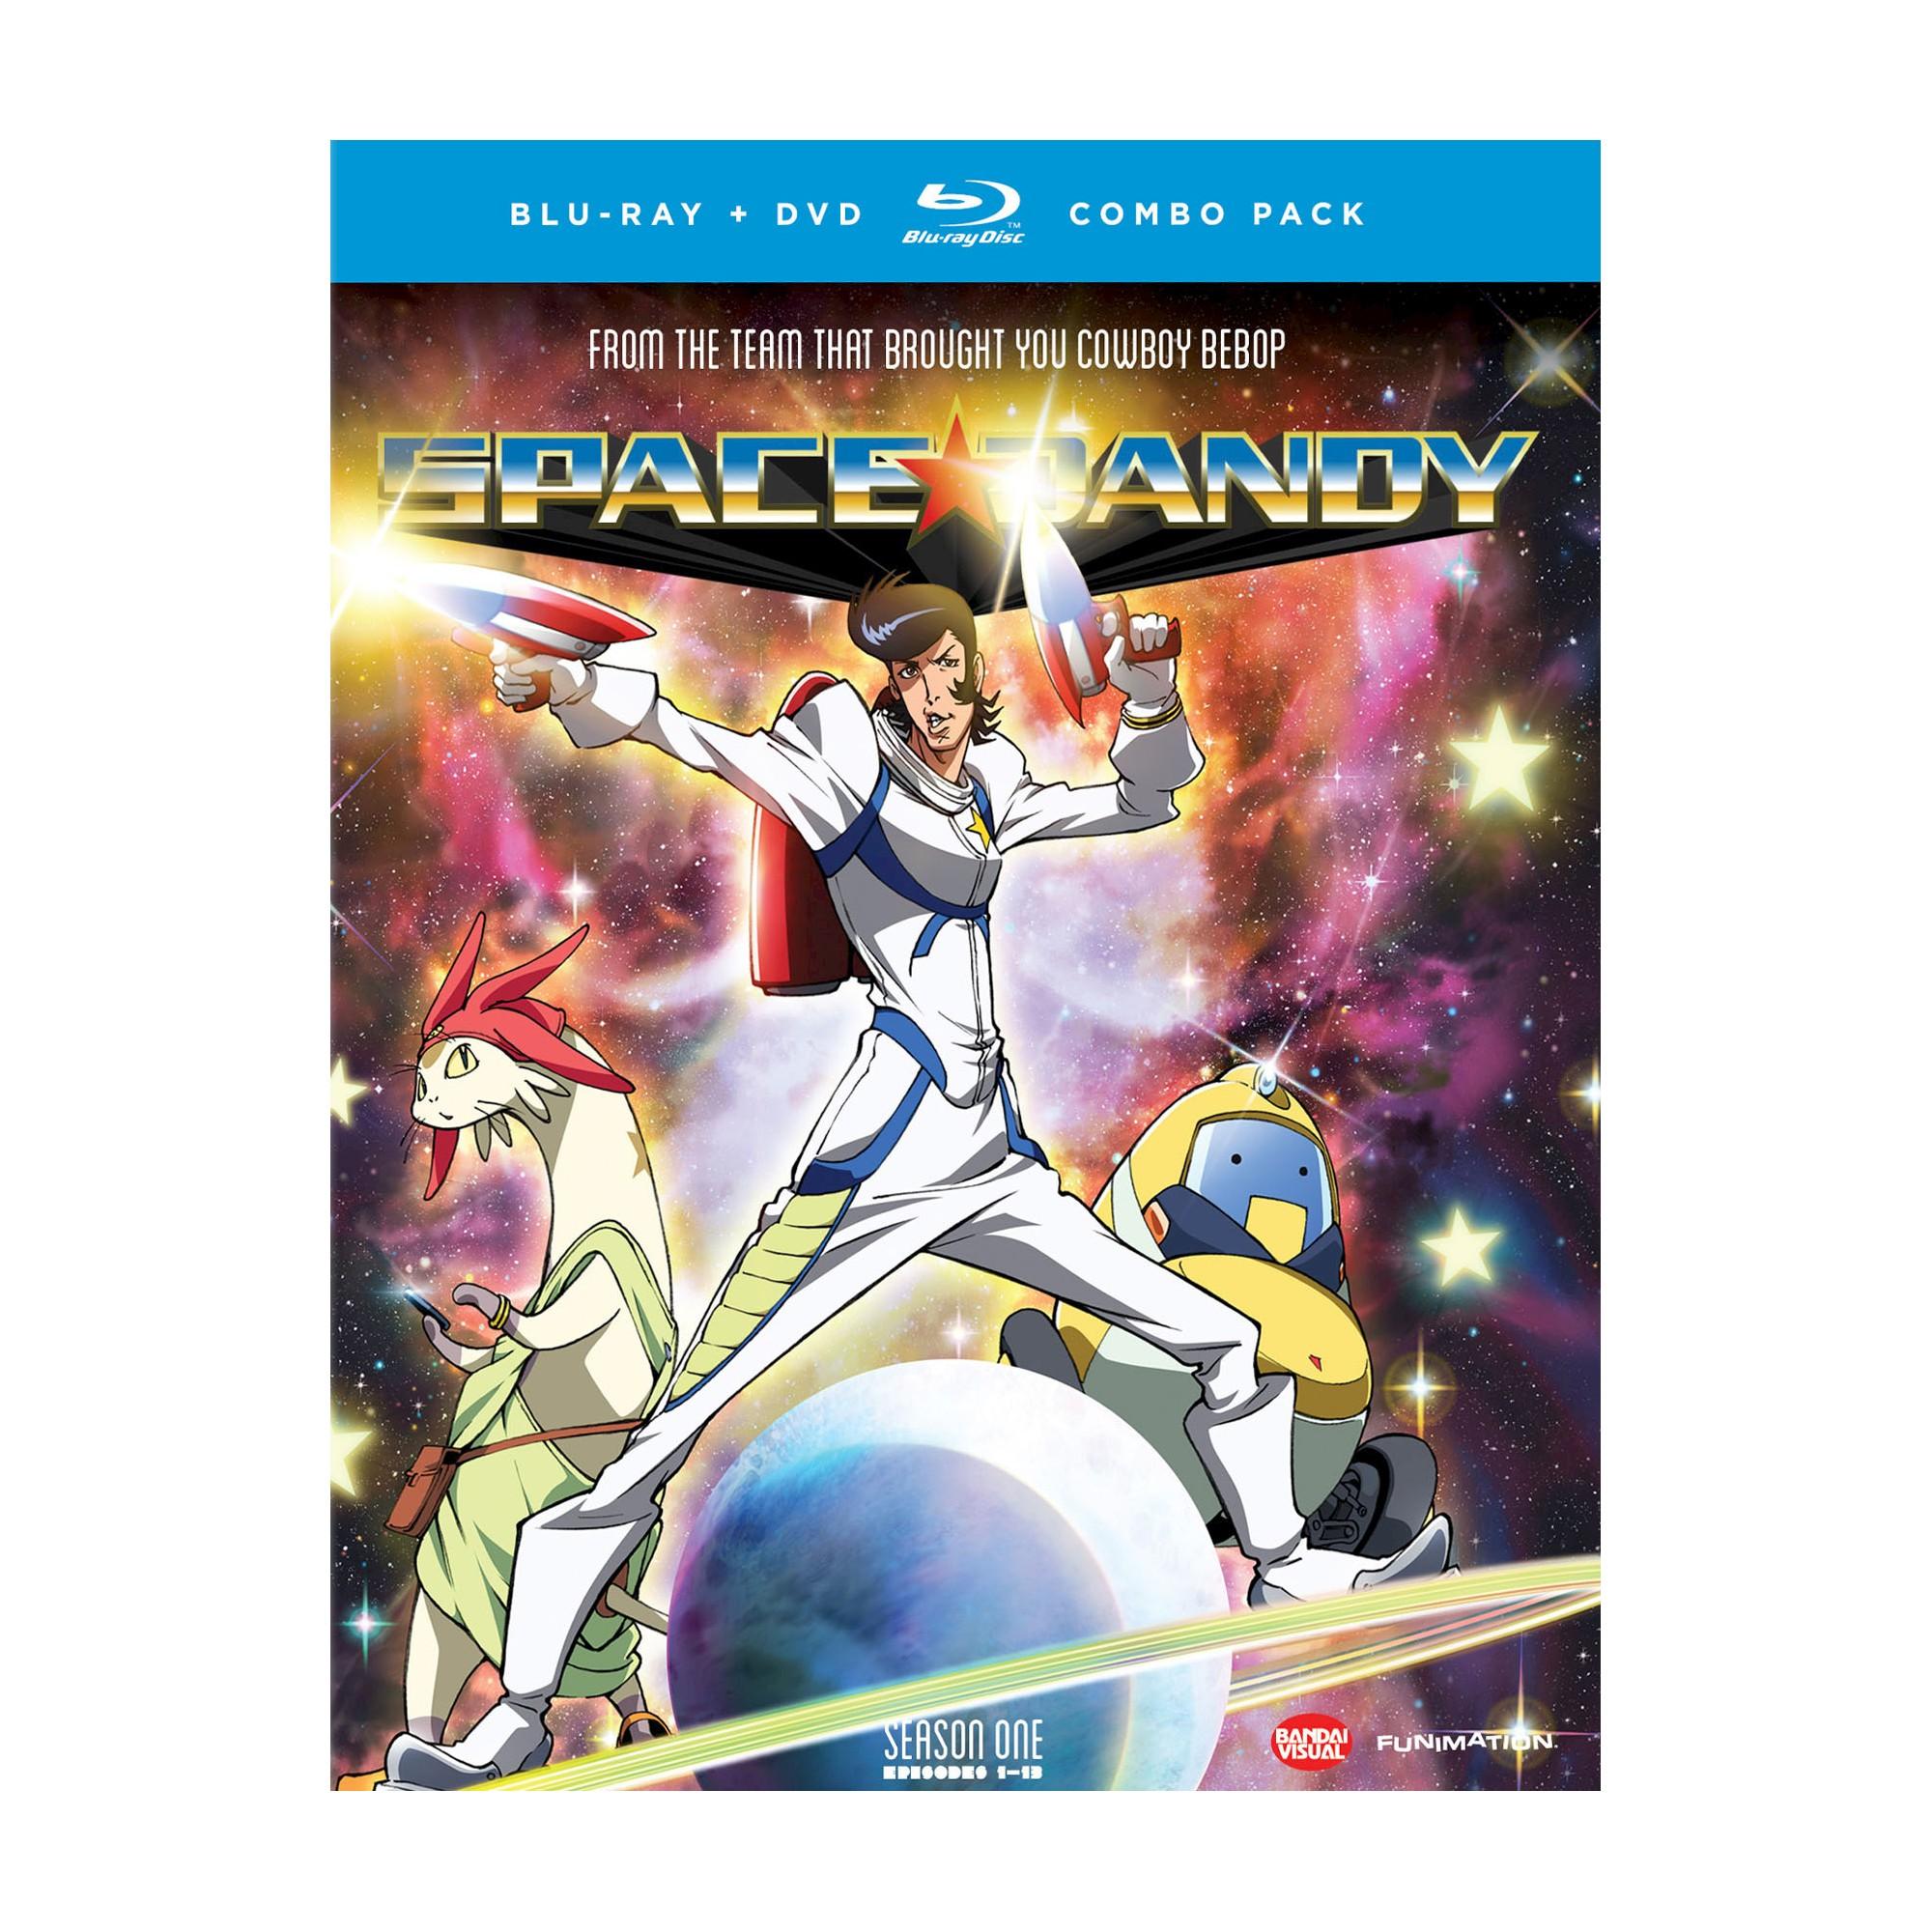 Space DandySeason 1 (Bd/Dvd Combo) (Bluray) Space